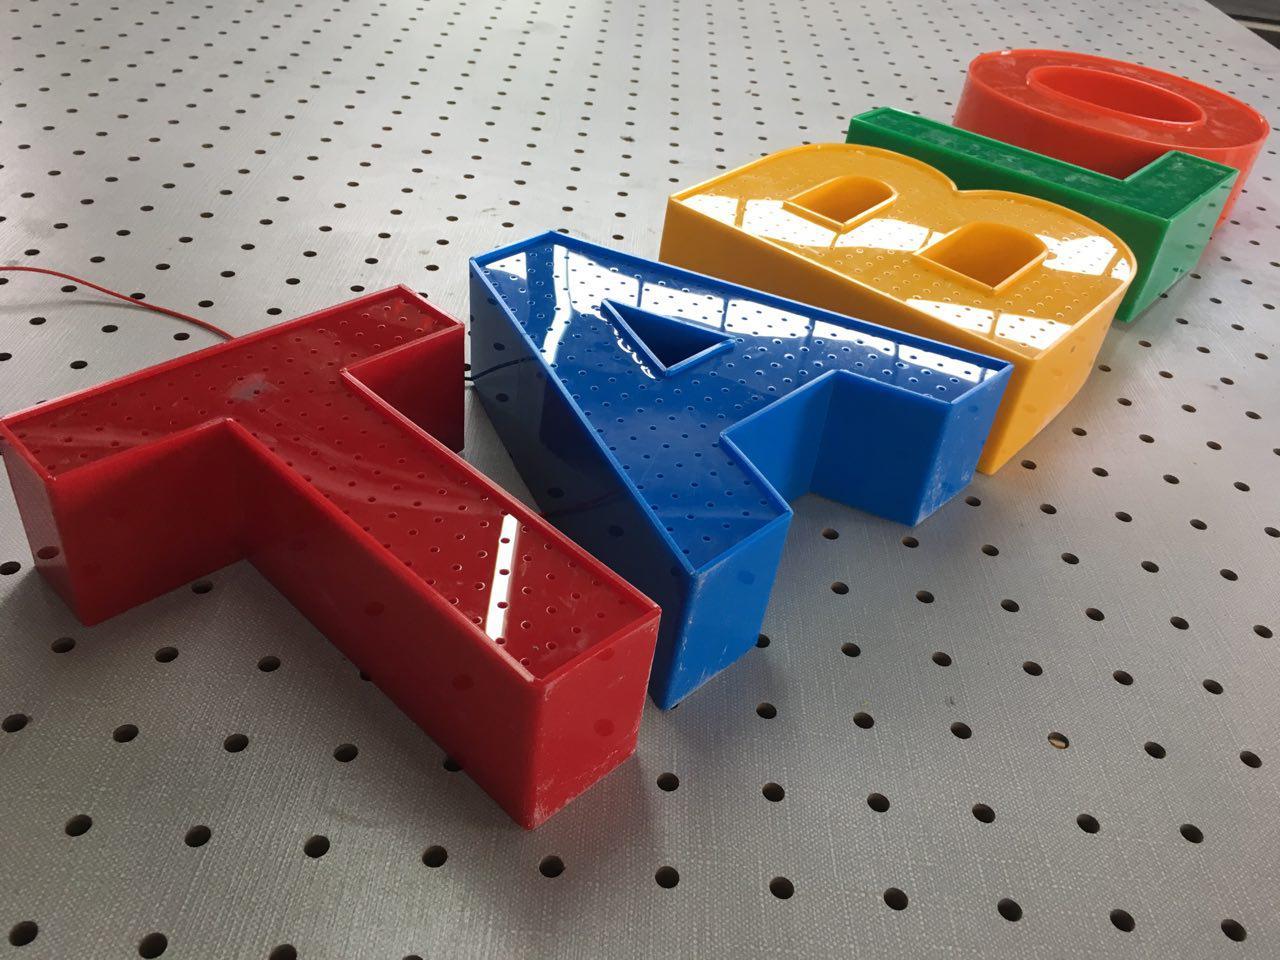 تابلوسازی حروف برجسته پلاستیک